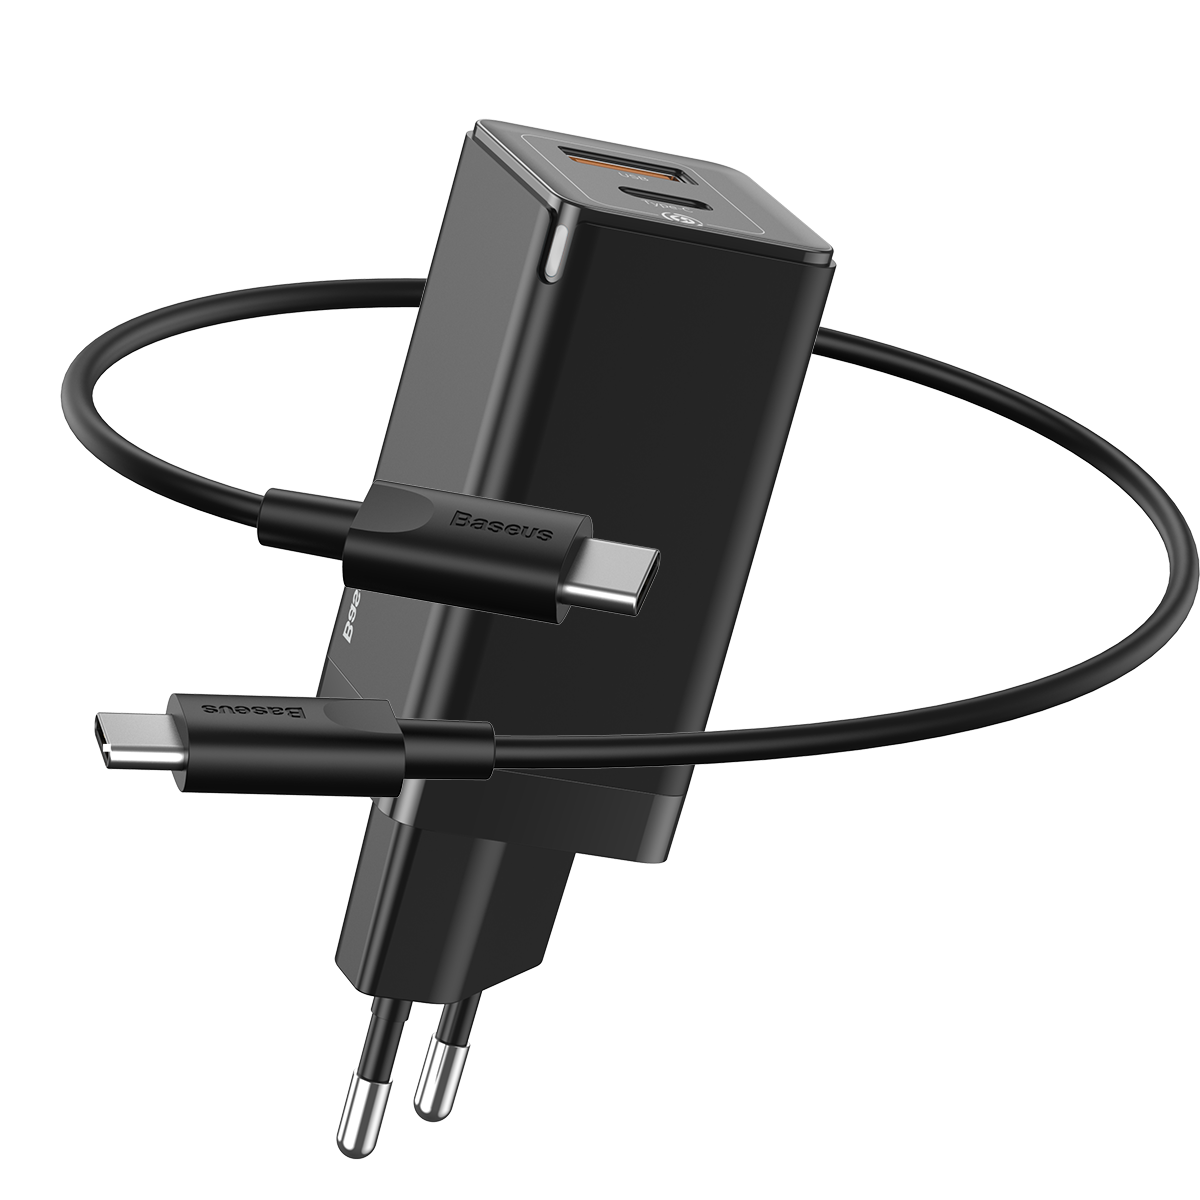 Carregador de Parede Baseus GaN Mini Quick Charger C+U 45w (Com cabo type-c para type-c 60w)